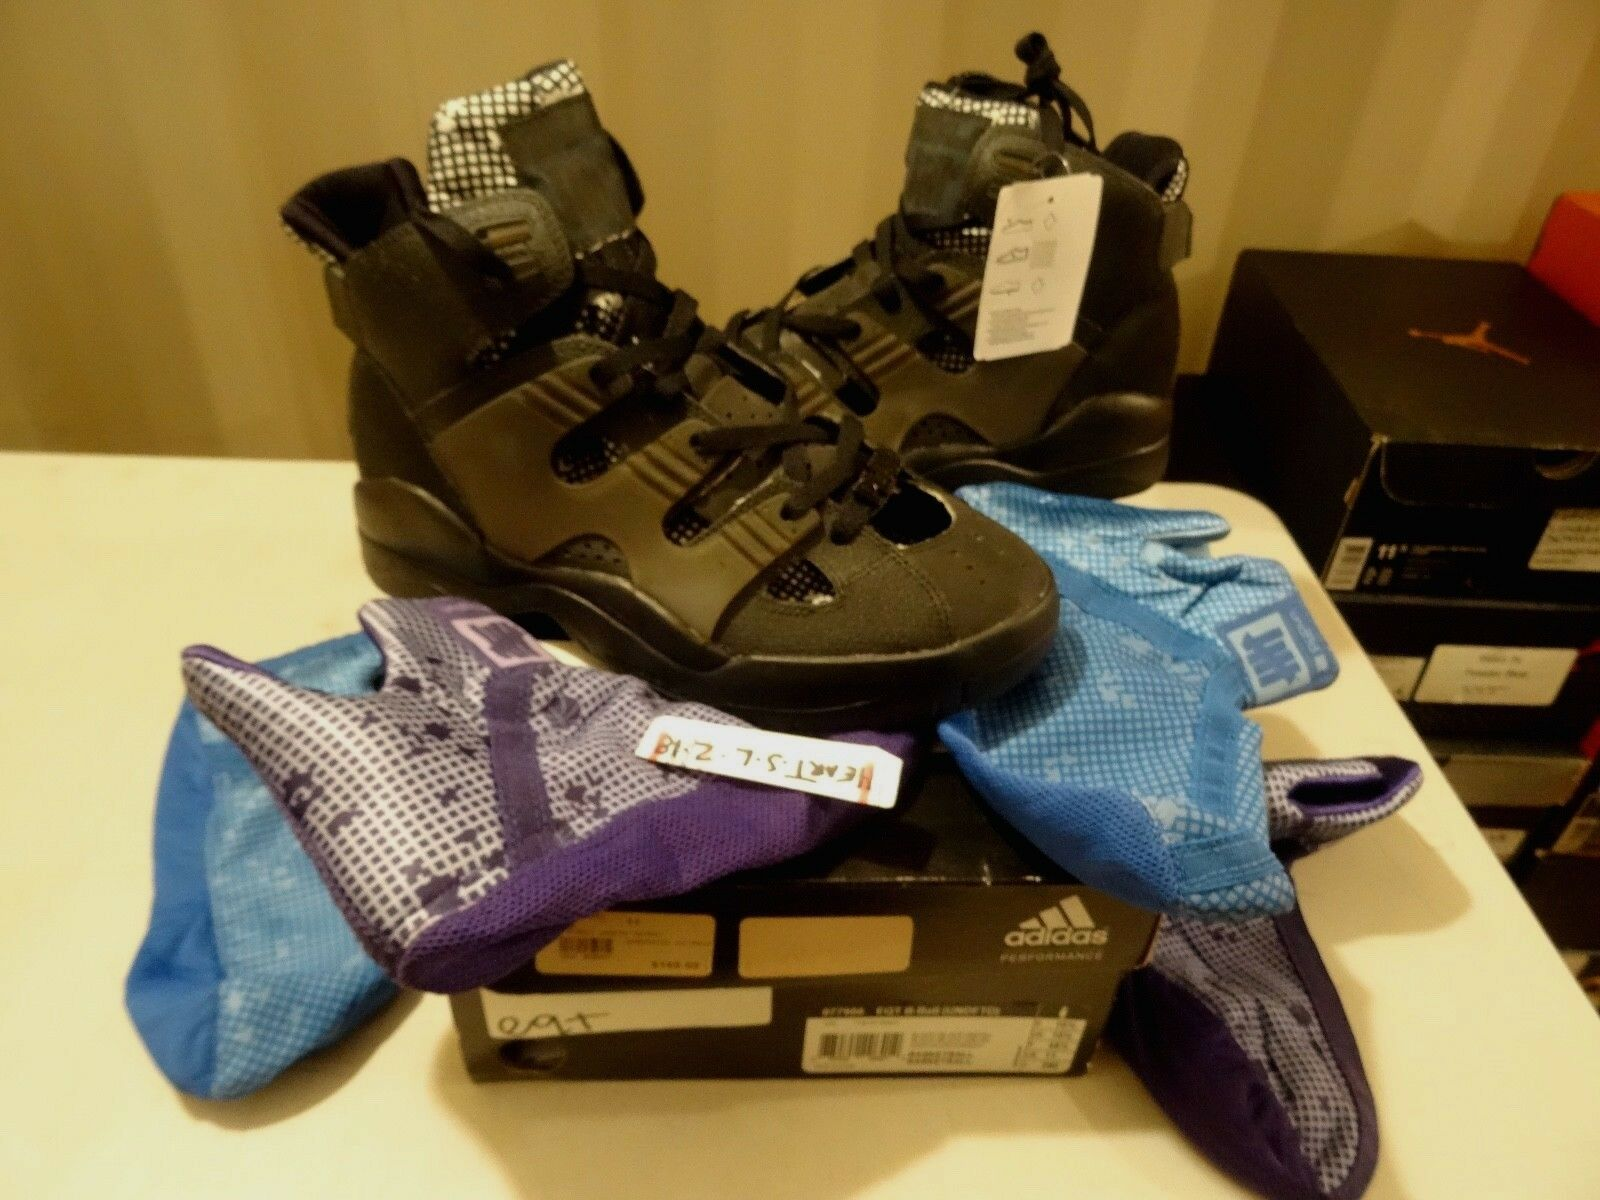 NEW Adidas x Undefeated KOBE 8 EQT B-Ball UNDFTD nero 0077986 SZ 13 YEEZY NMD